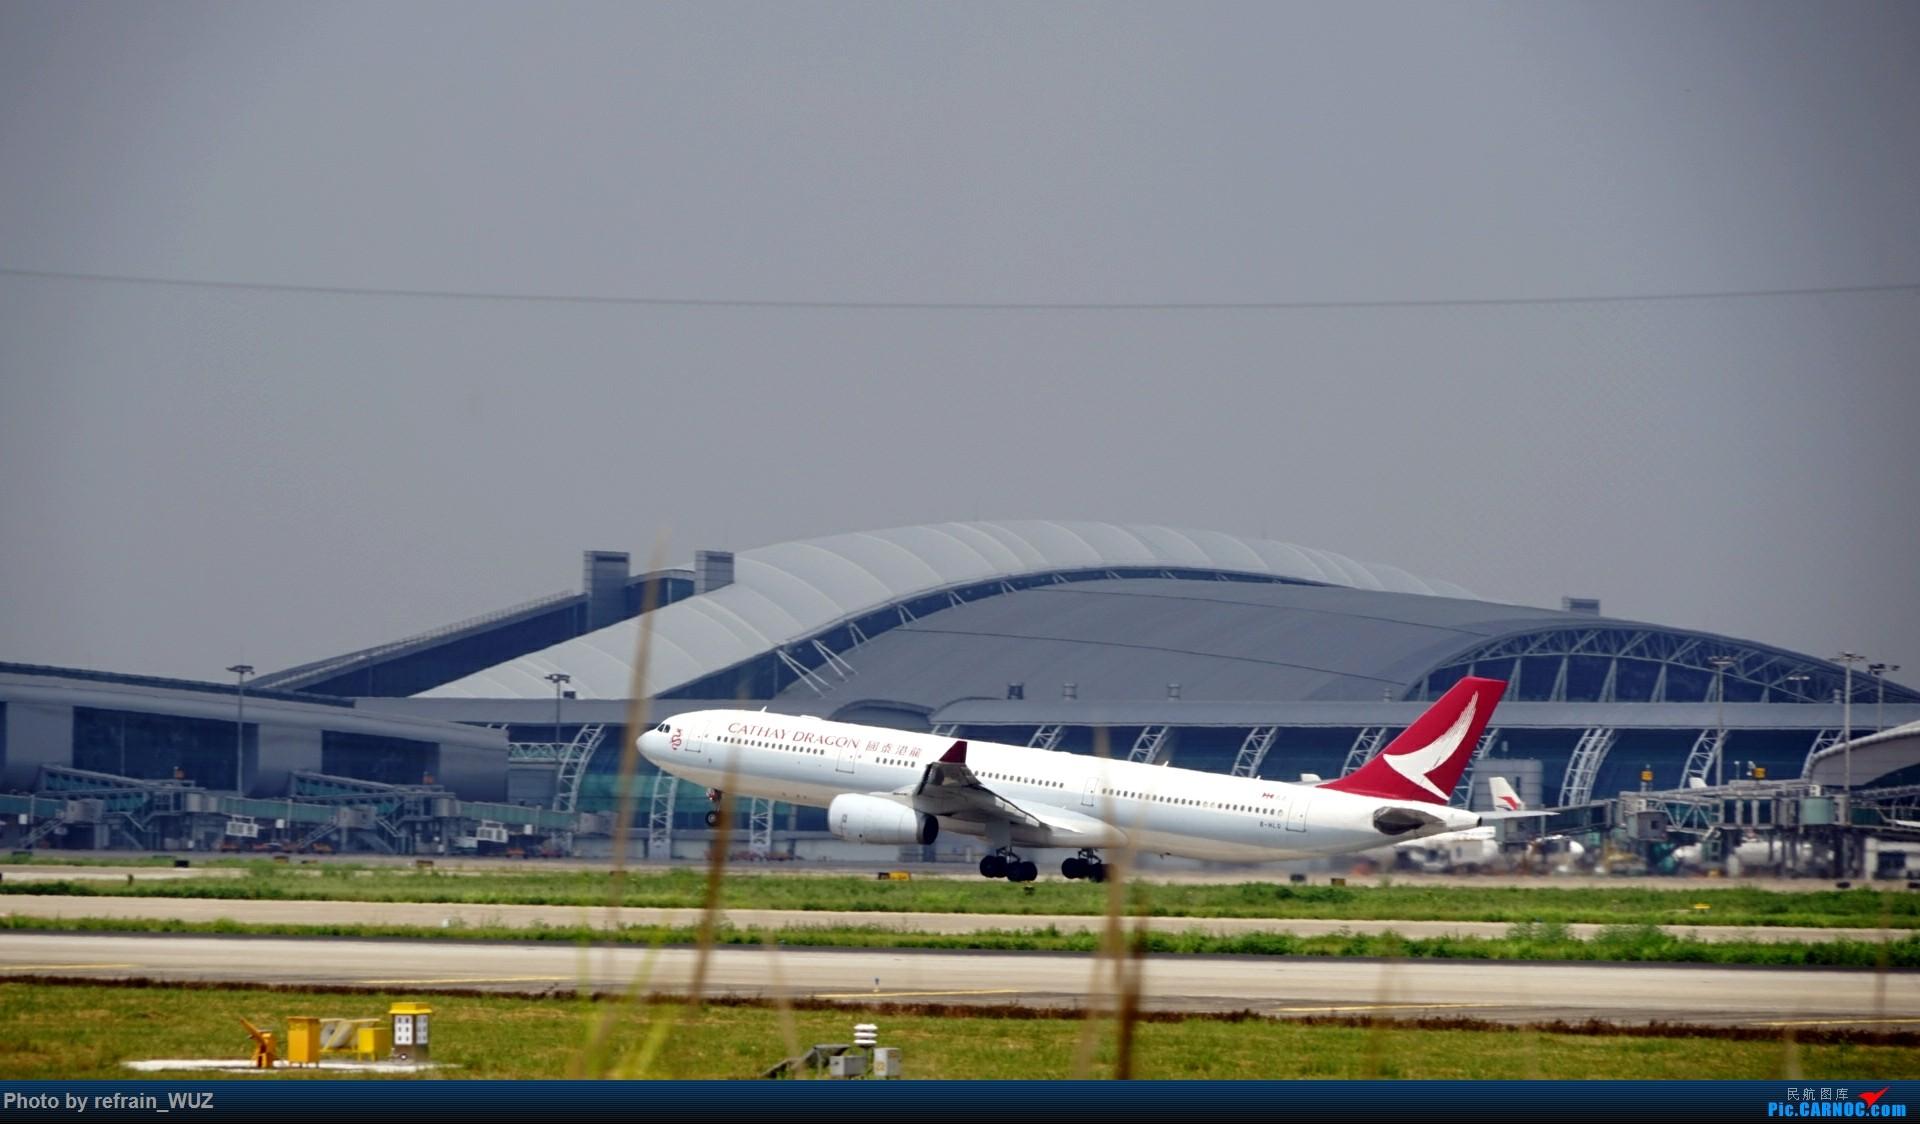 Re:[原创]CAN白云打机,全部系大嘢,最长的最粗的都有了! AIRBUS A330-300 B-WLG 中国广州白云国际机场